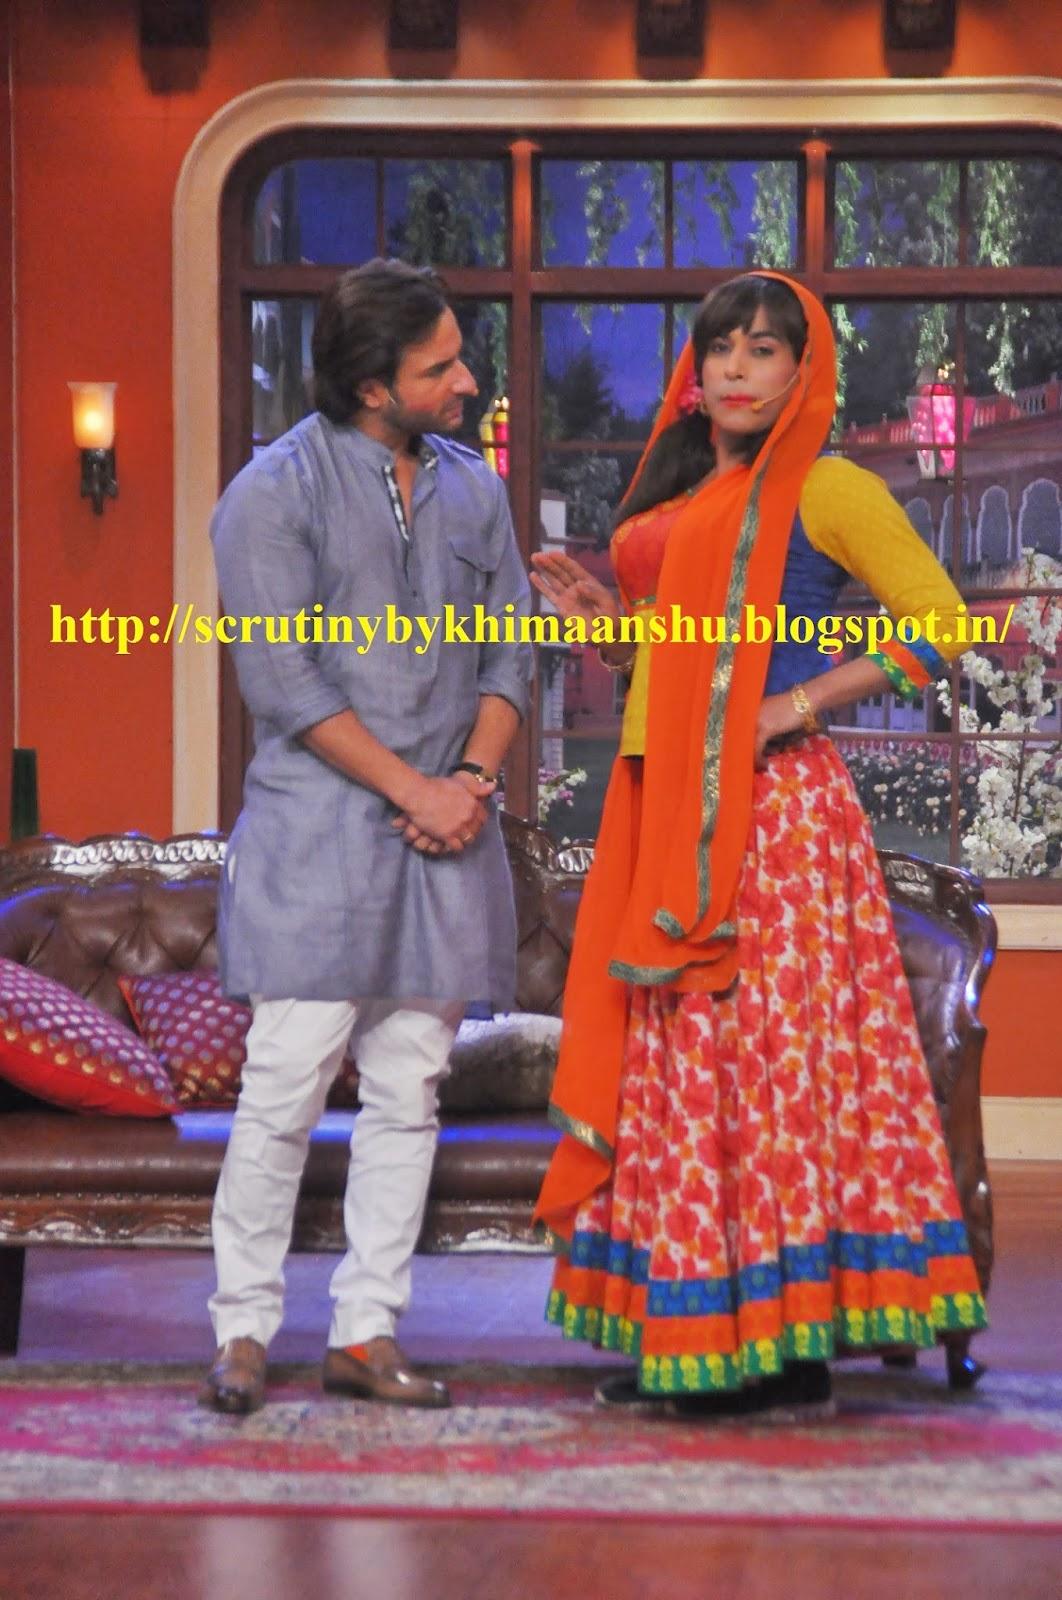 Scrutiny meet dulari laccha s friend on comedy nights with kapil